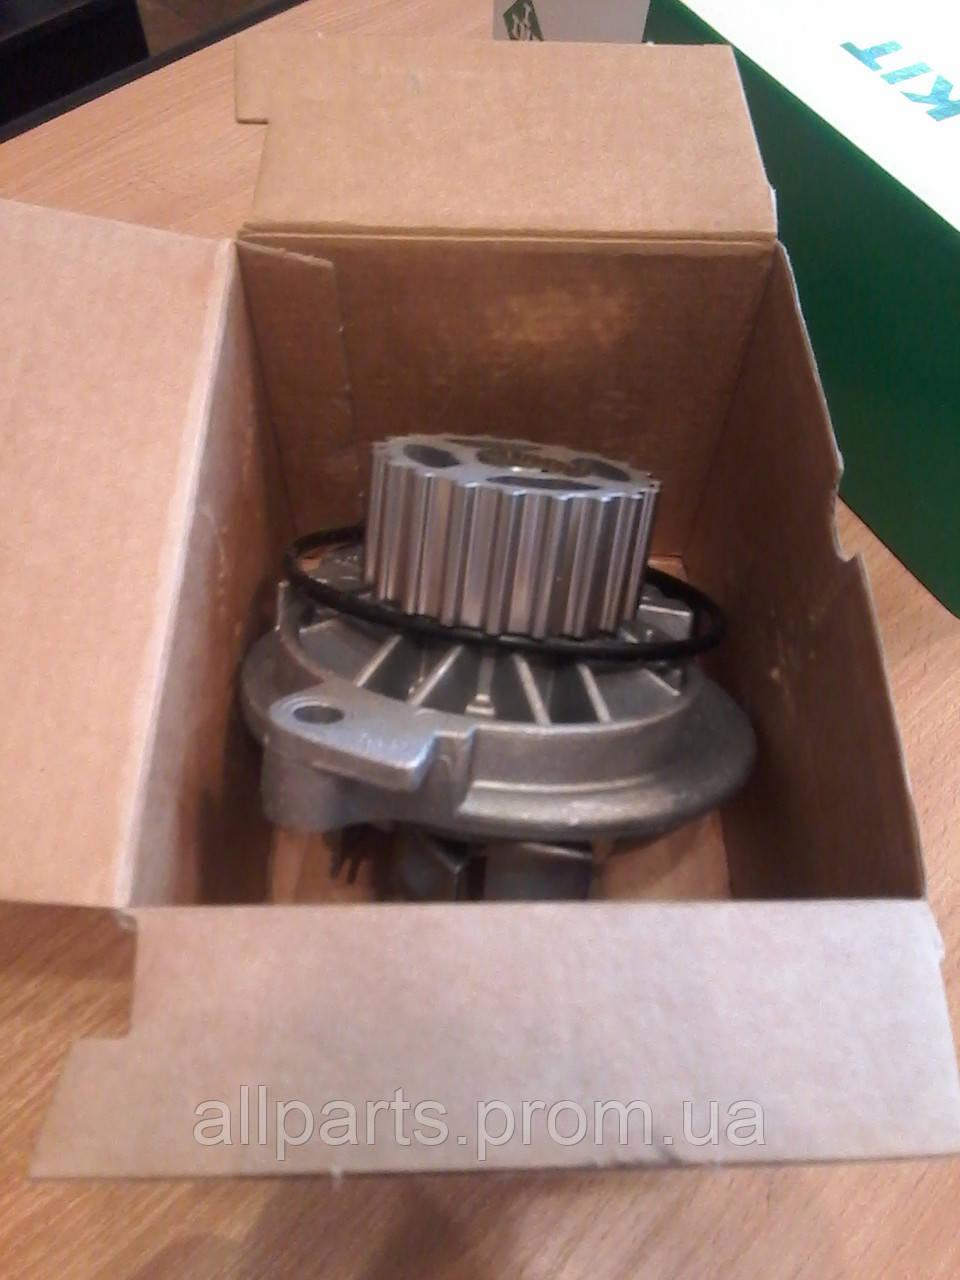 Водяной насос (помпа) VW Transporter T4, LT I/II (28-35, 28-46) 2.4/2.5 TDi/D, Crafter 2.5TDI, z=20